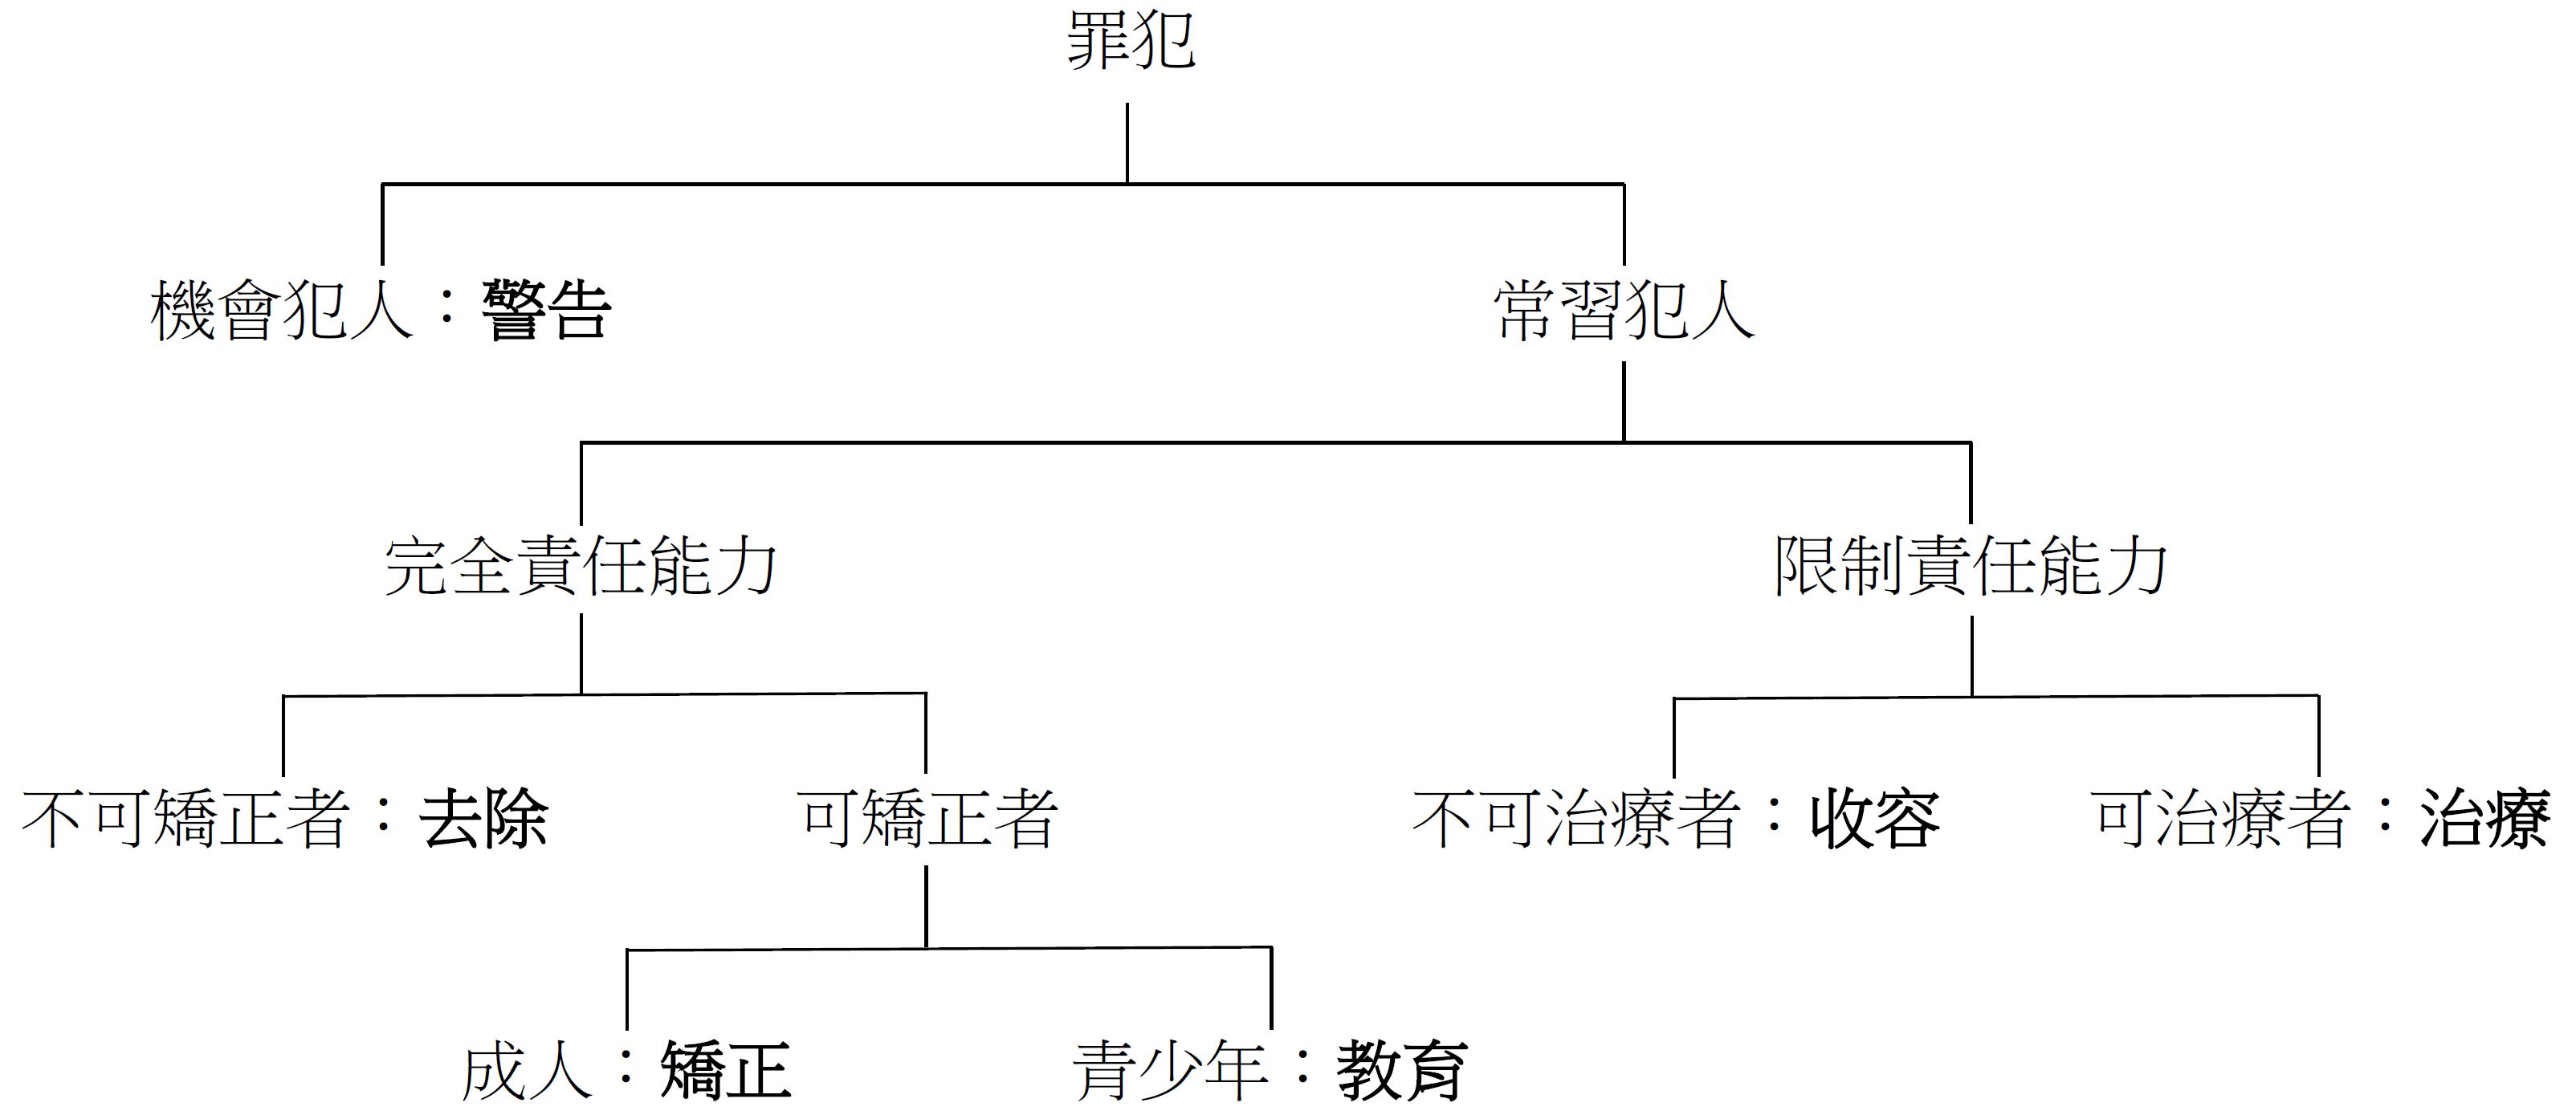 Filediagram of sentenceg wikimedia commons filediagram of sentenceg ccuart Image collections